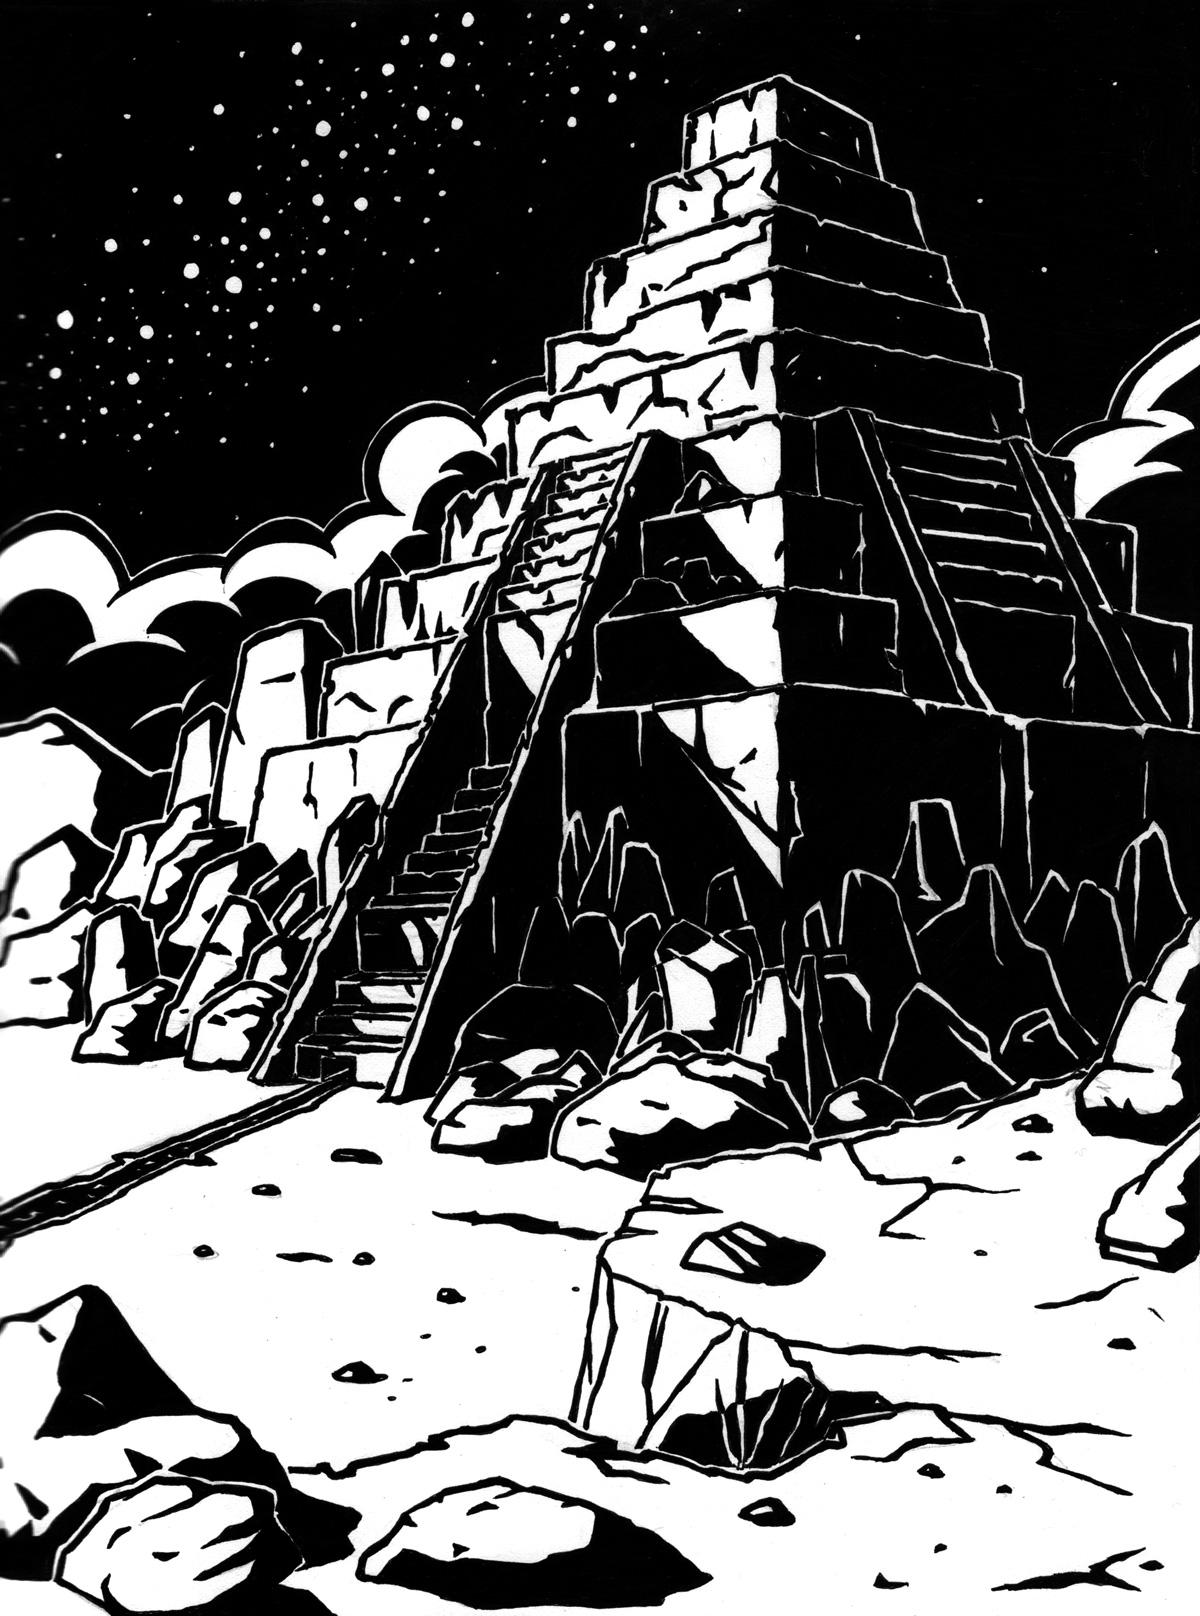 Soleil noir, pyramide